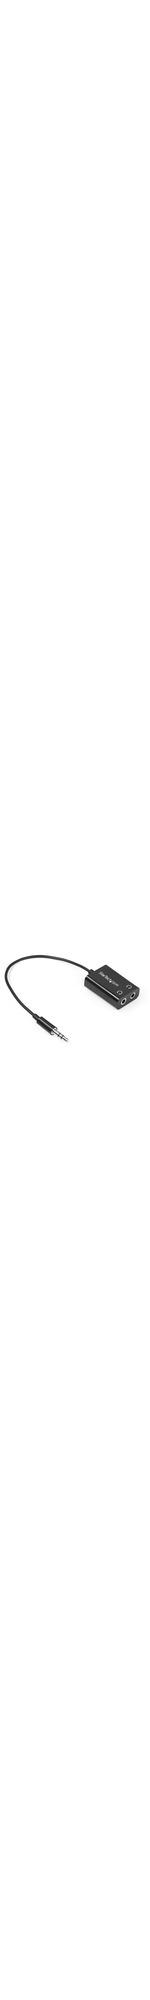 StarTech.com Black Slim Mini Jack Headphone Splitter Cable Adapter